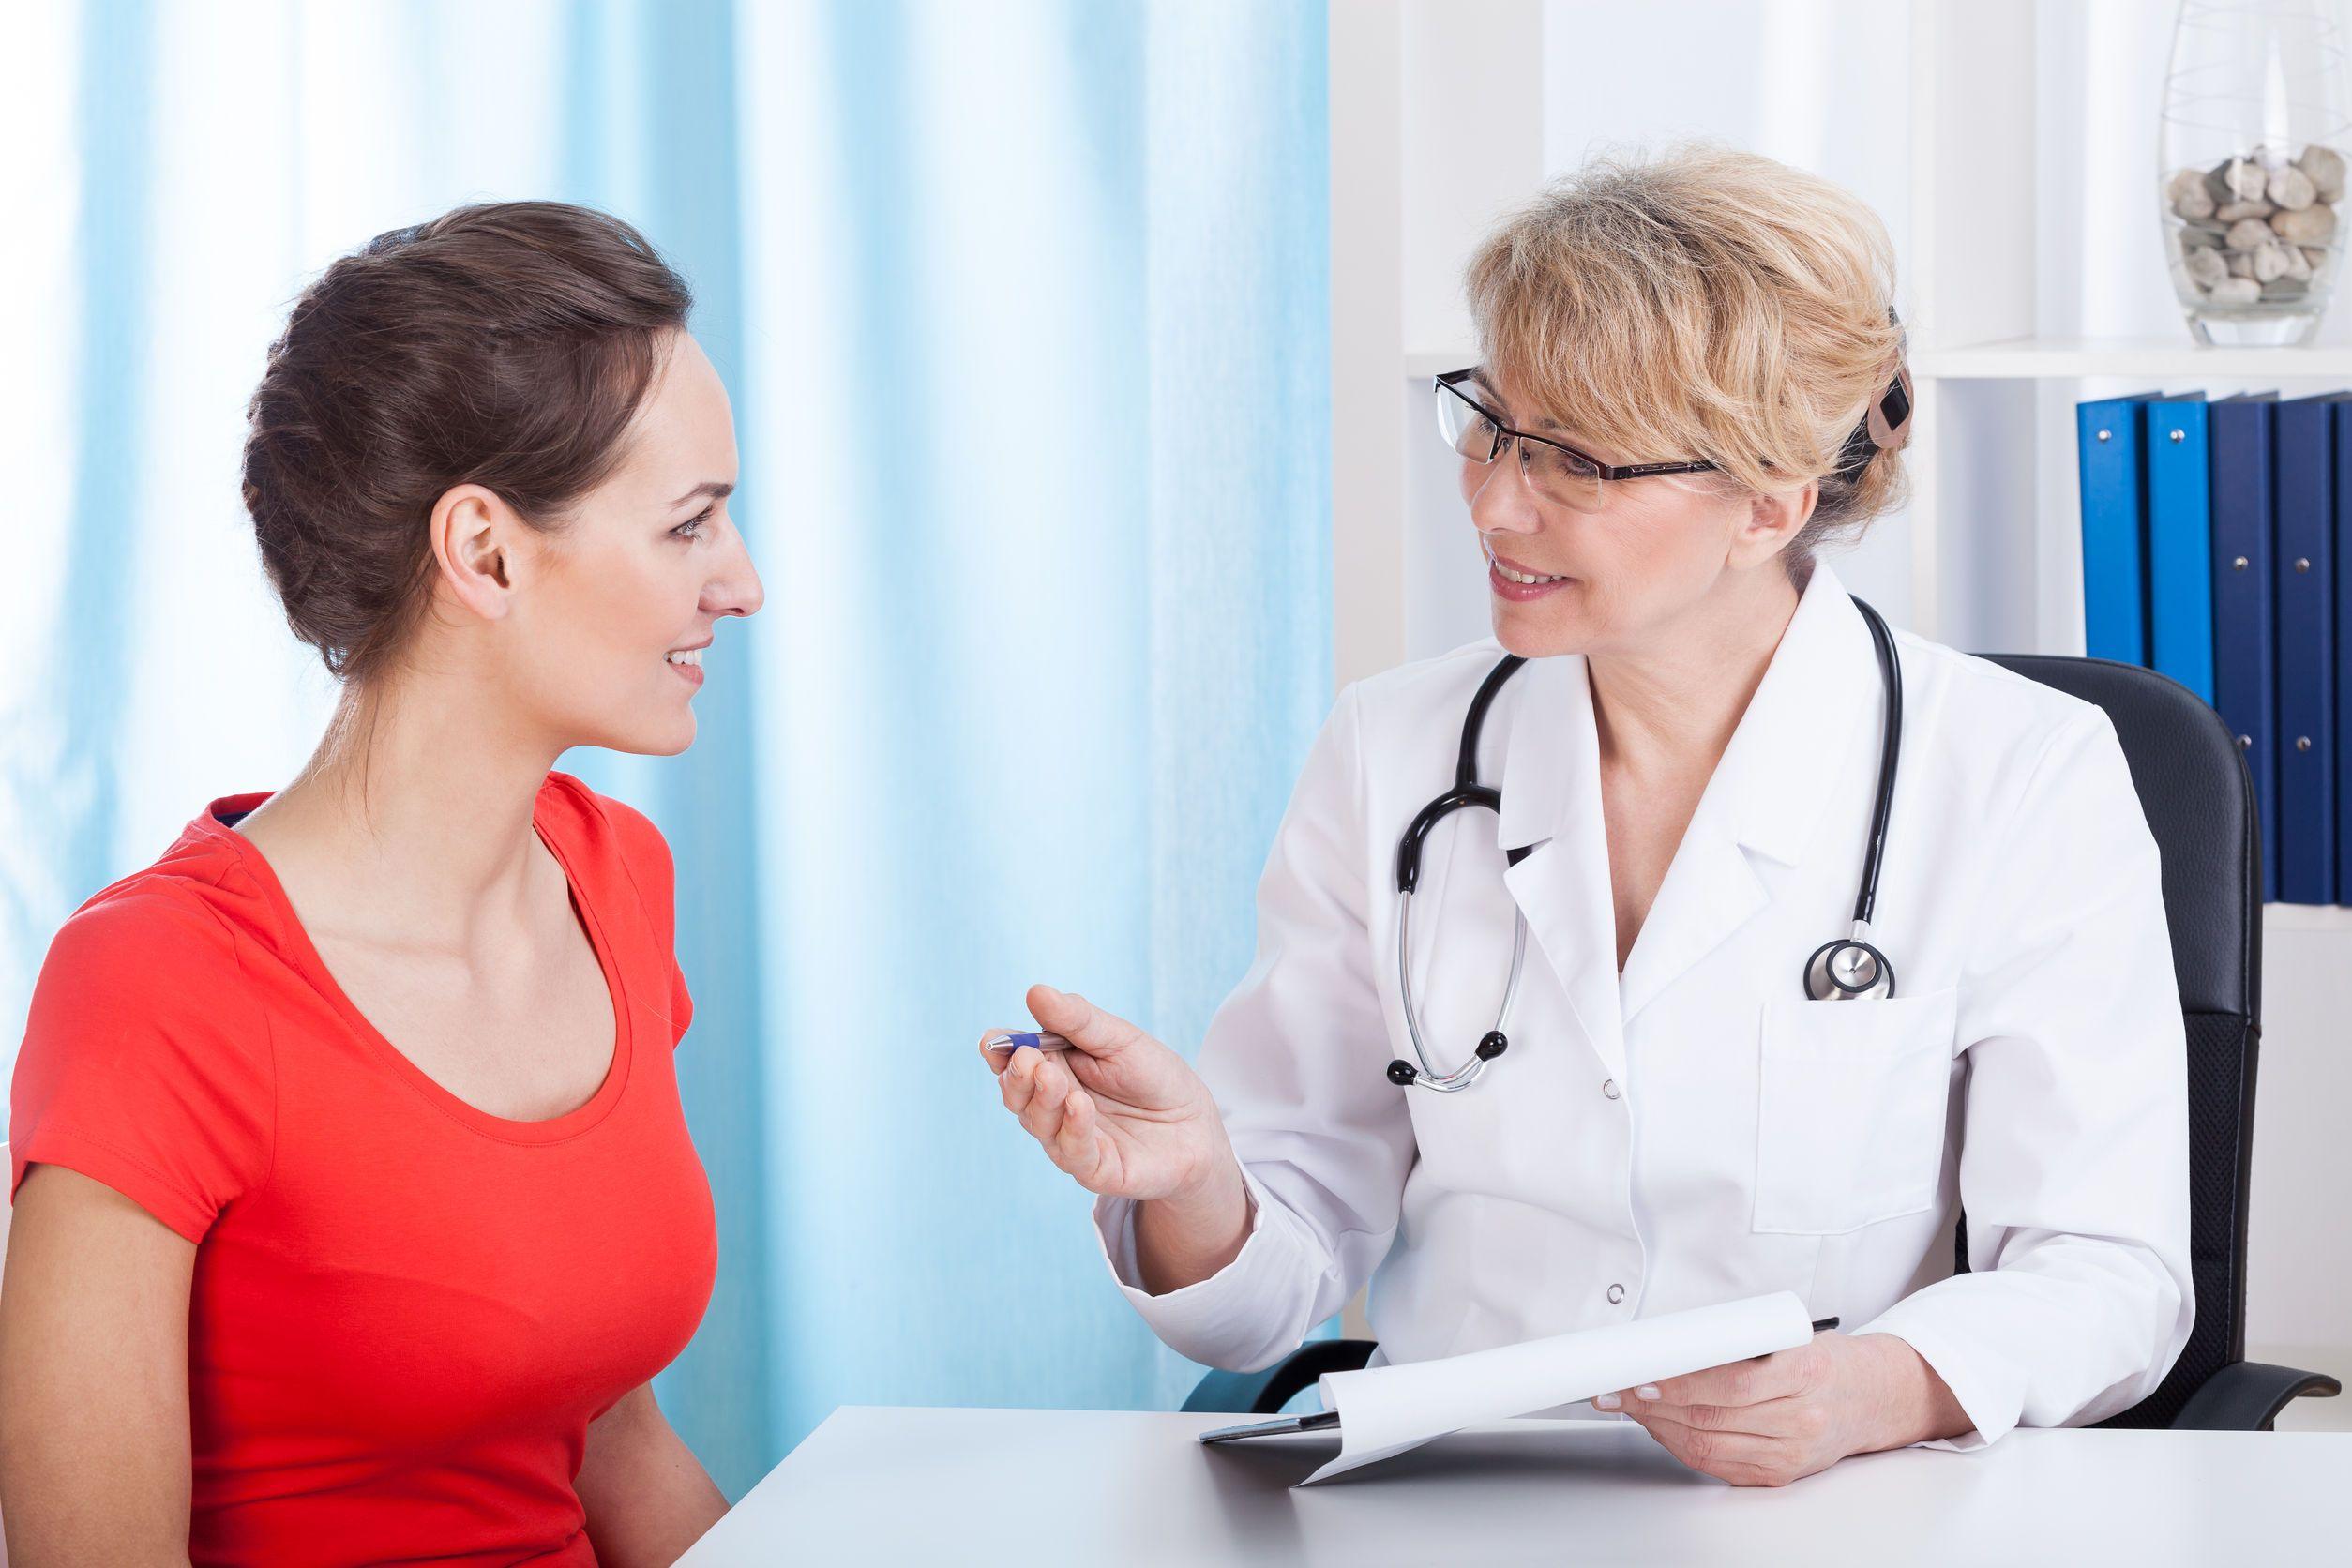 Assessment Of Methylation Status Part 1 | El Paso, TX Chiropractor